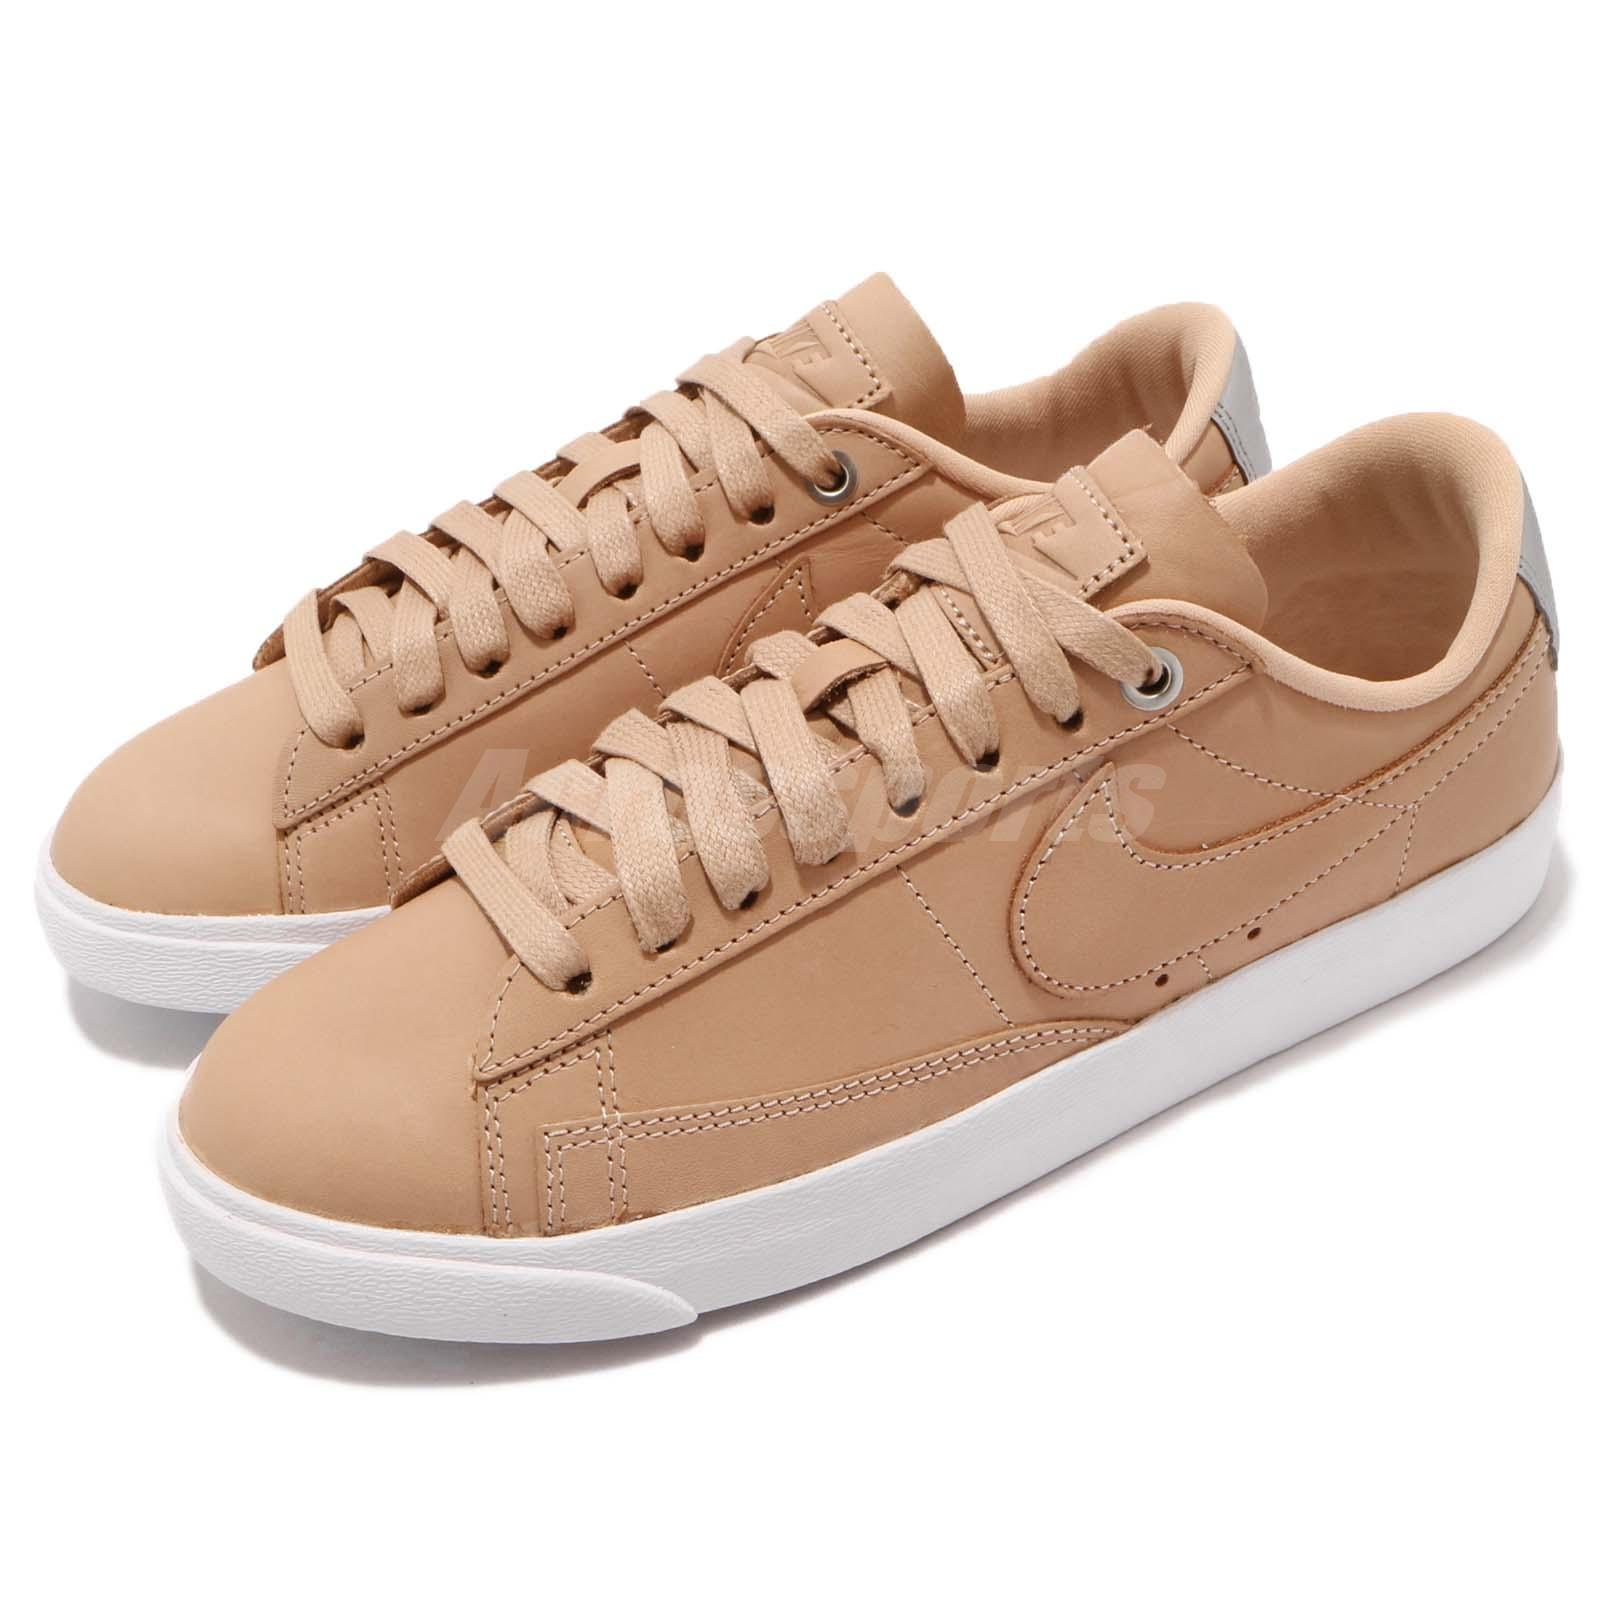 Nike Wmns Blazer Low SE PRM QS Beige Vachetta Tan White Women Shoes AA1557200